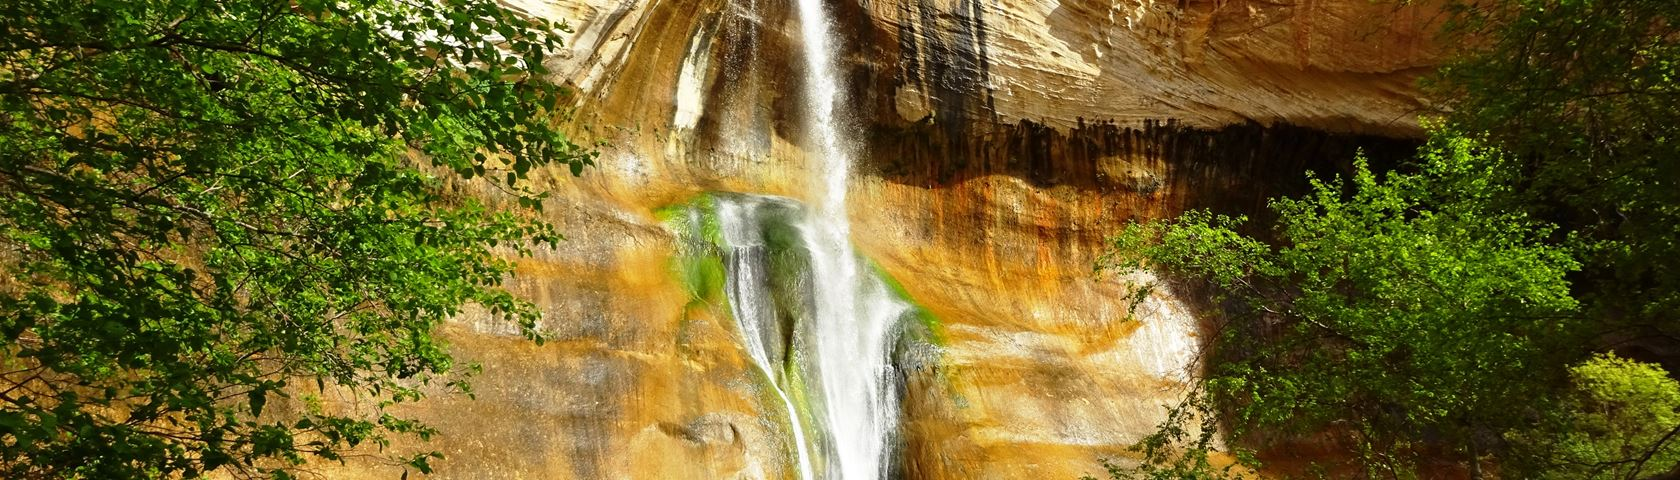 Lower Calf Creek Waterfall